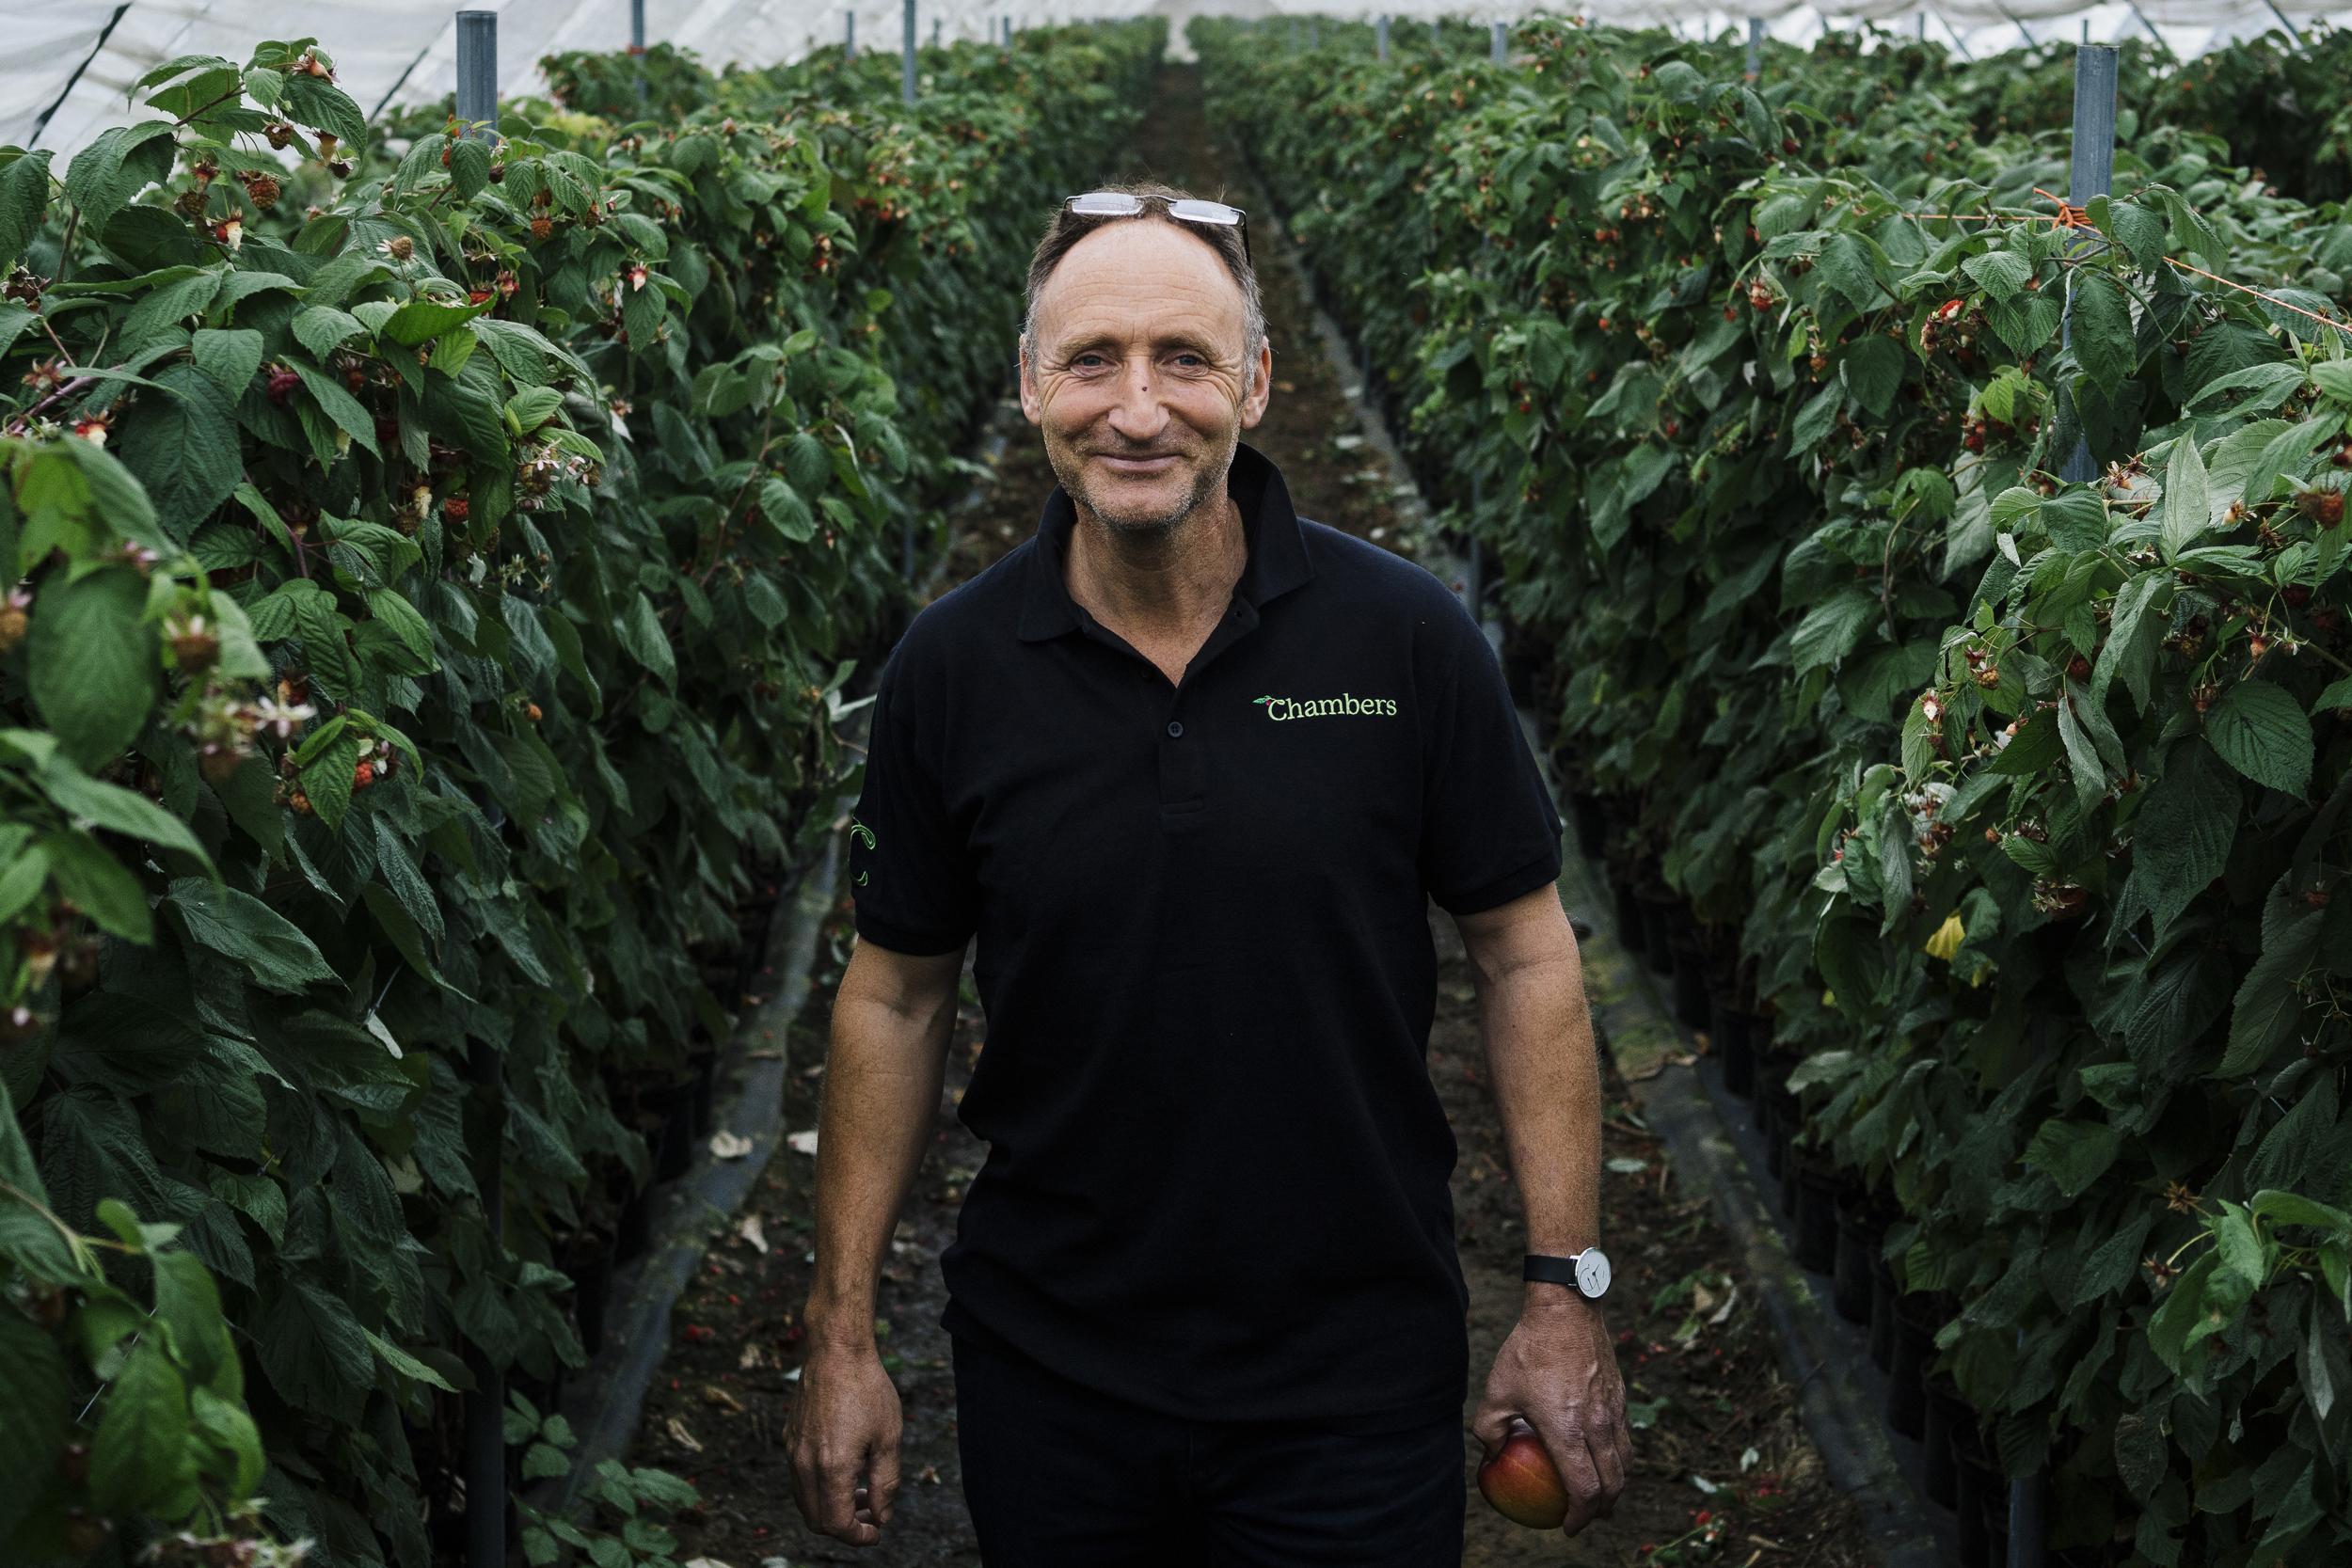 Image: British farmer Tim Chambers at Oakdene Farm